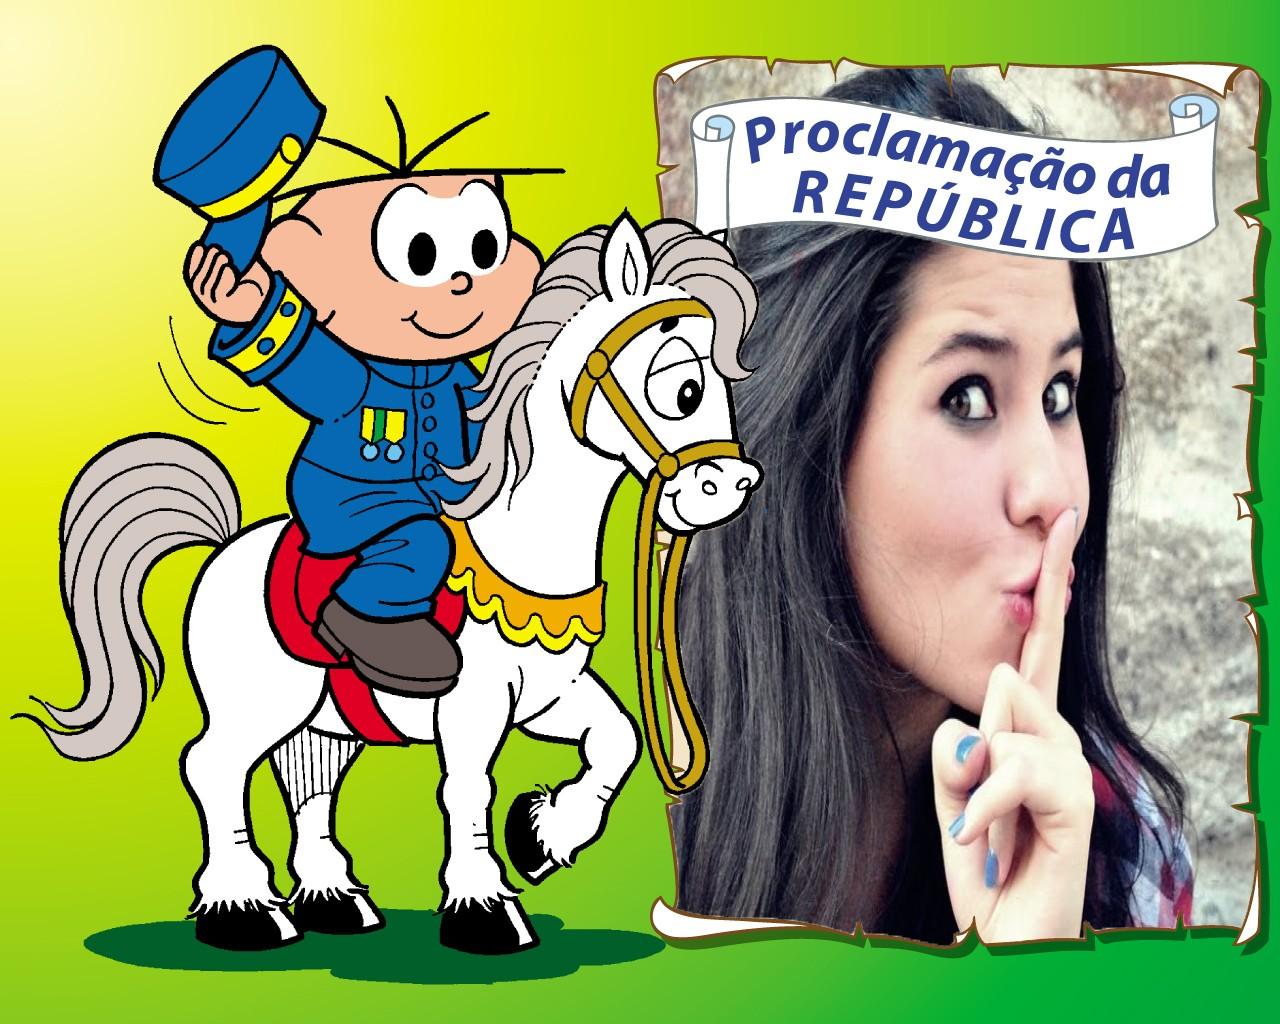 moldura-proclamacao-da-republica